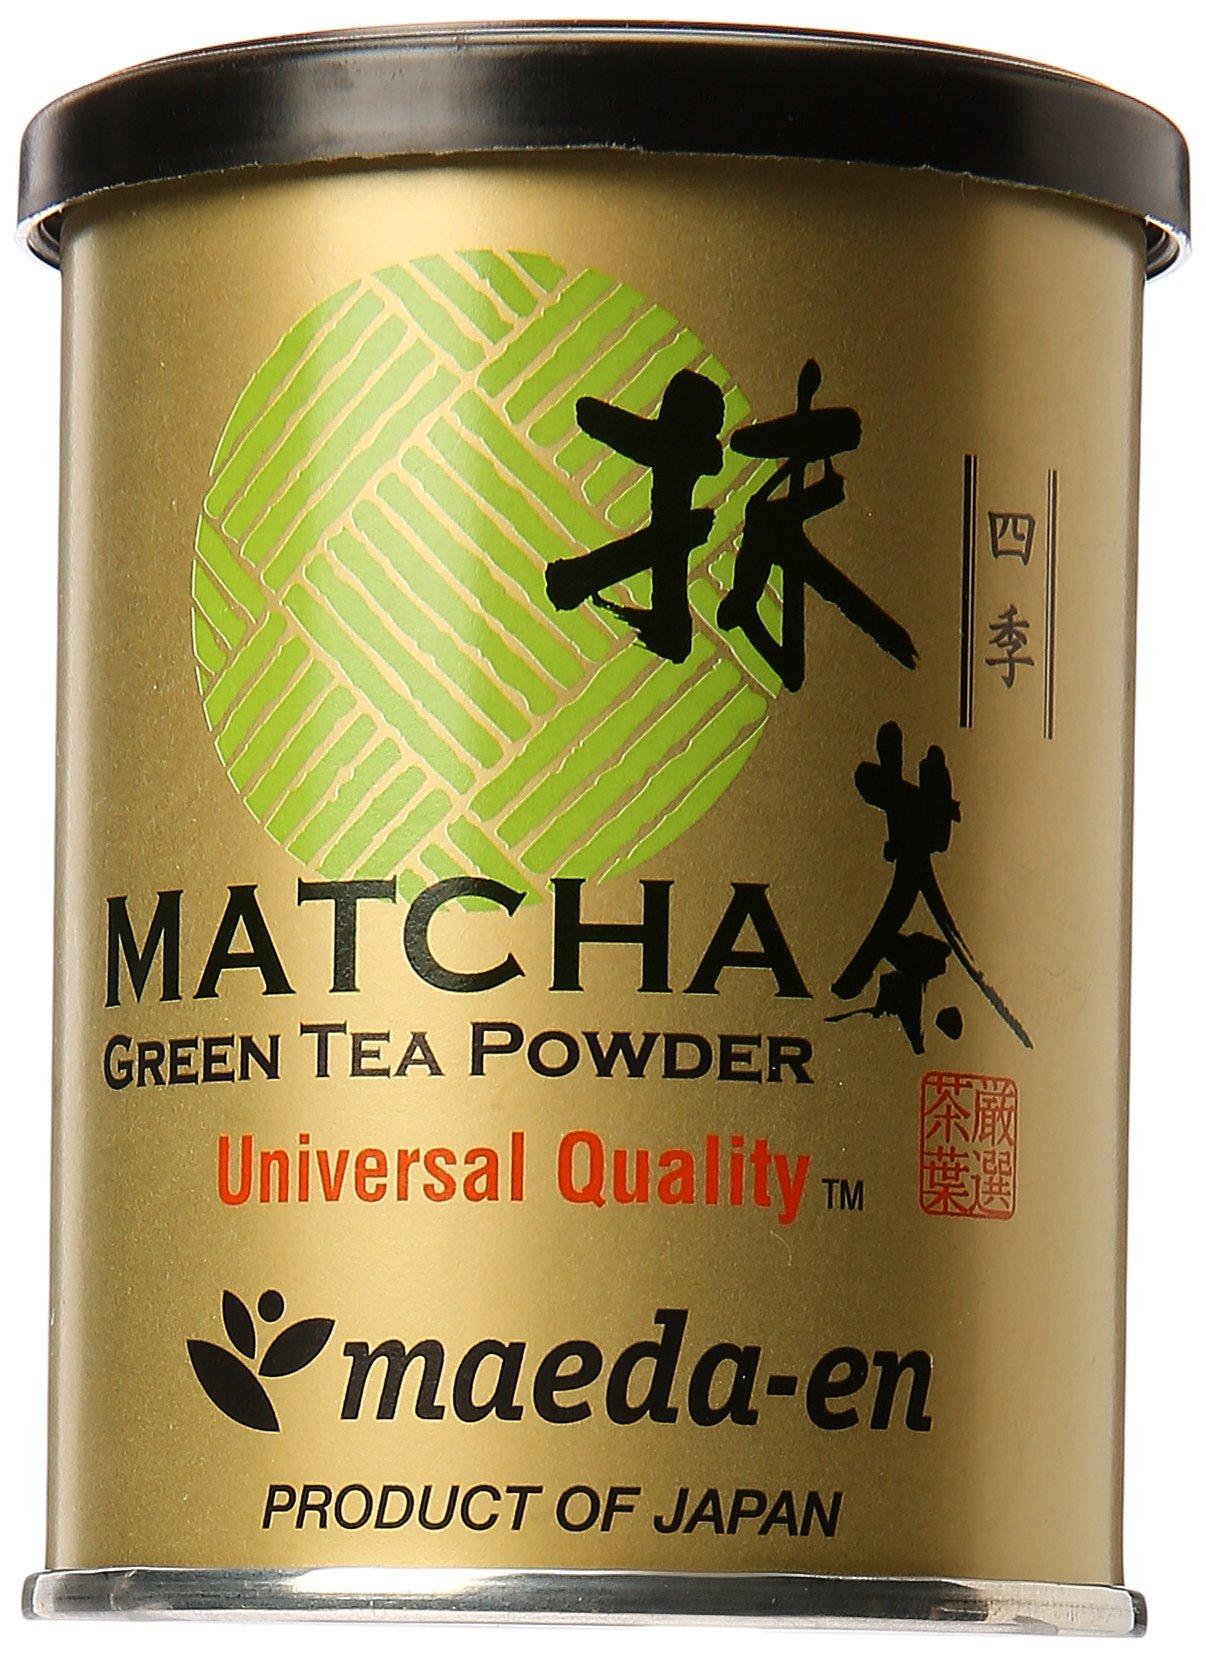 Maeda-En - Shiki Matcha (green tea powder) 1.0 Oz (Pack of 4)